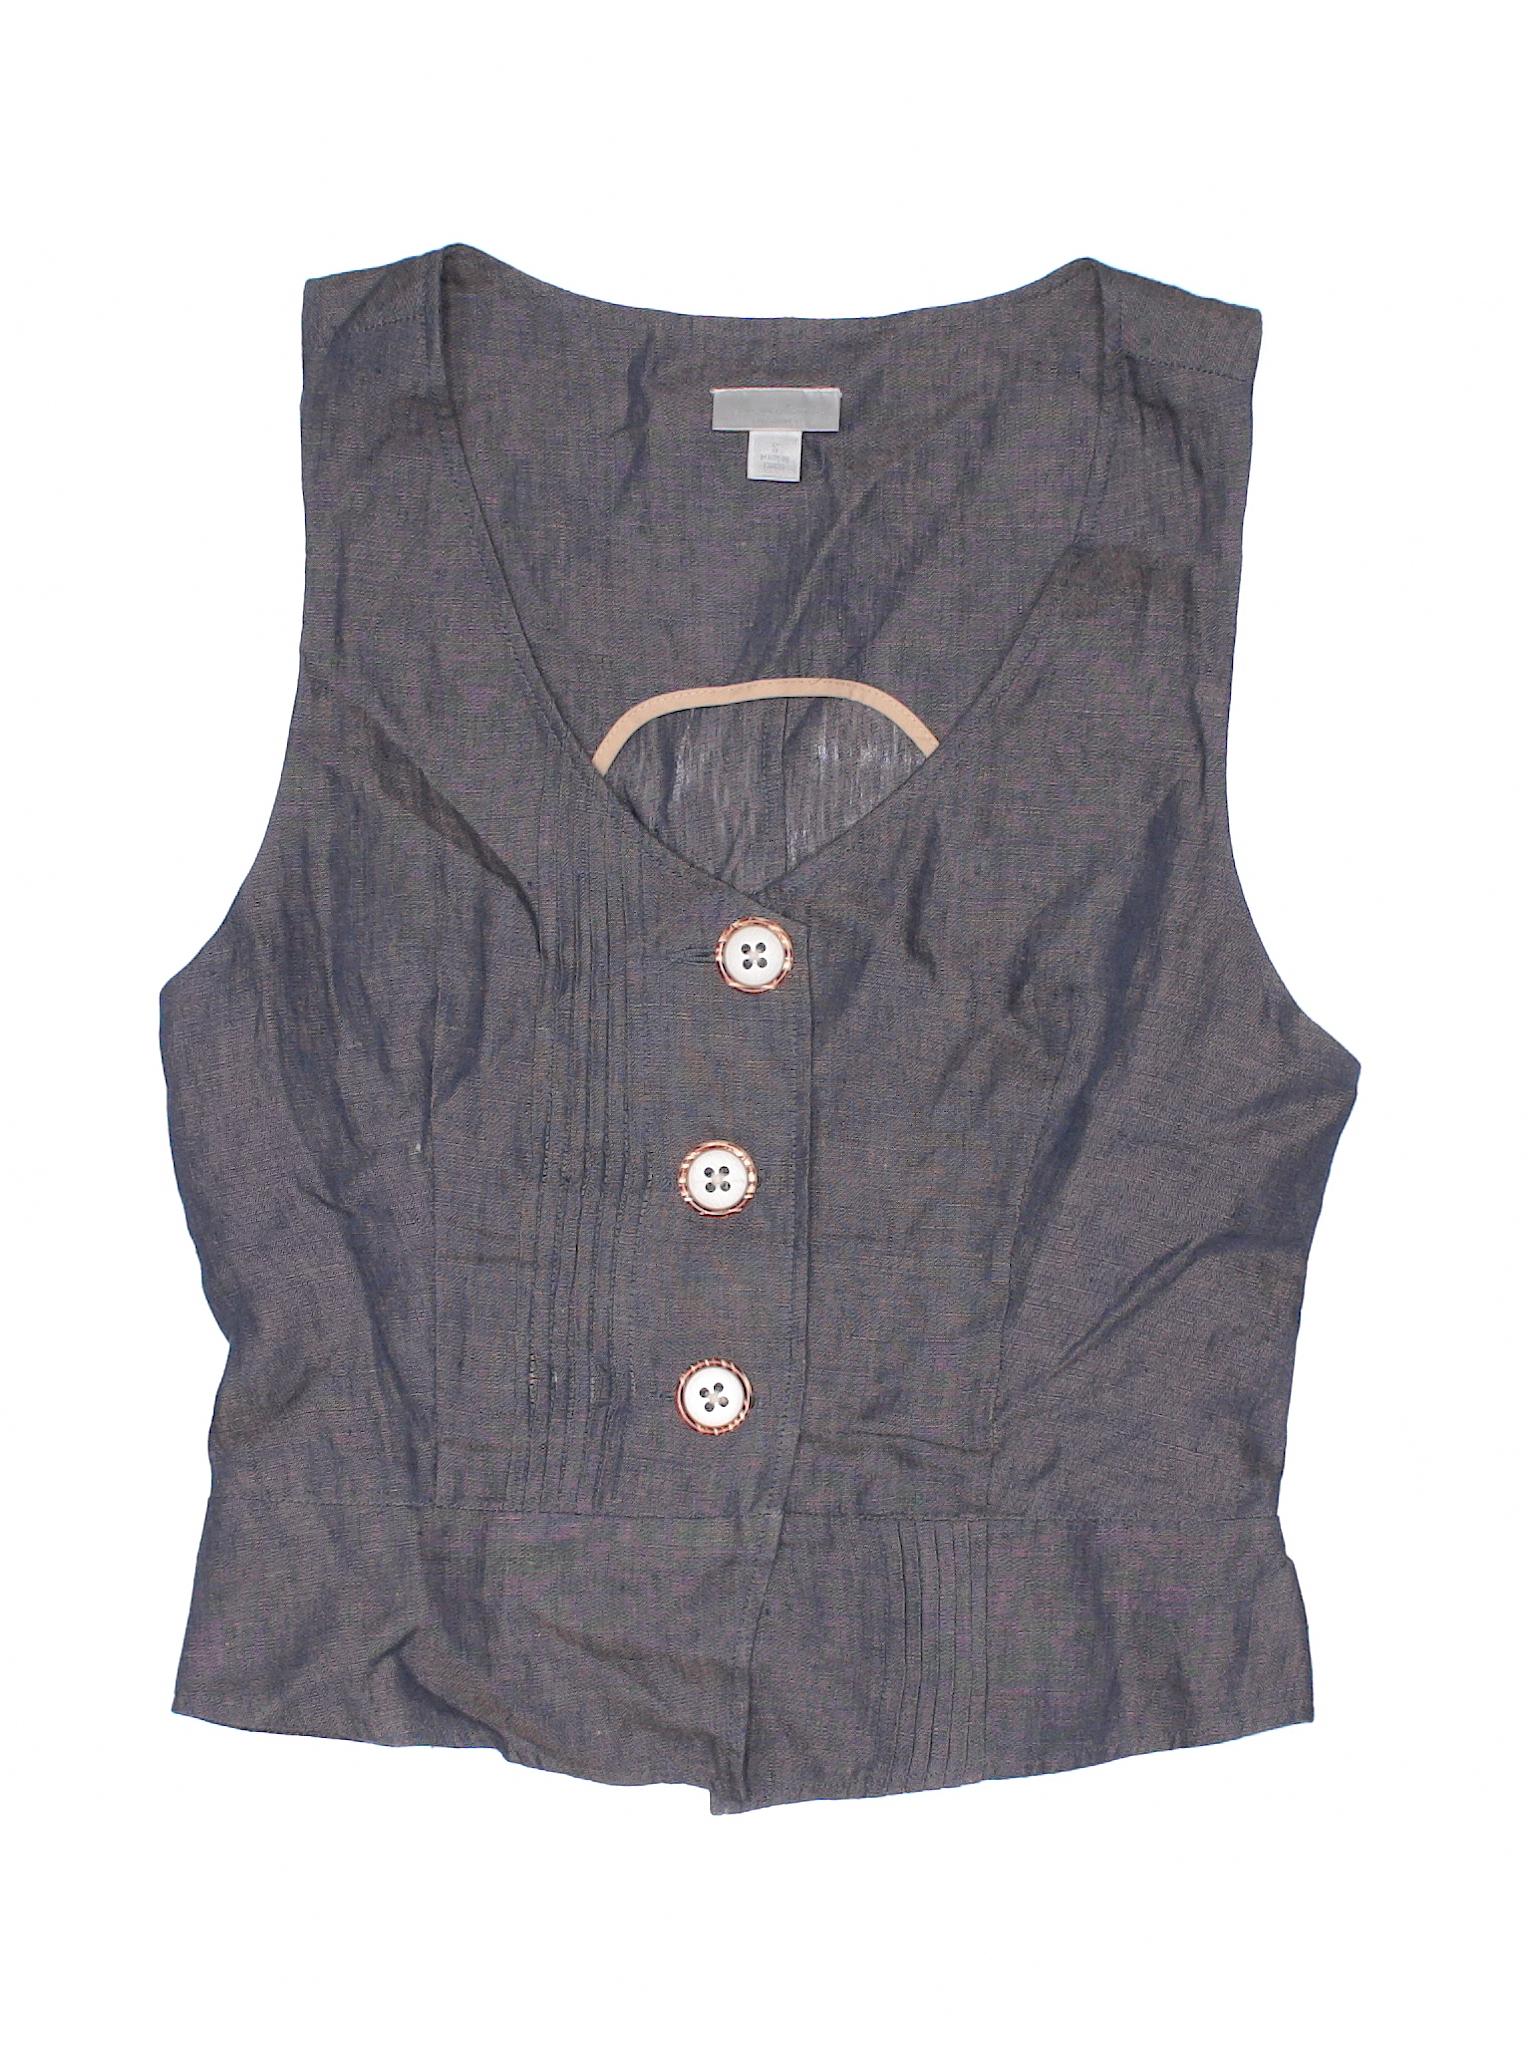 Vest Target Hawk Tuxedo Boutique for winter Jovovich Uqw7wBA